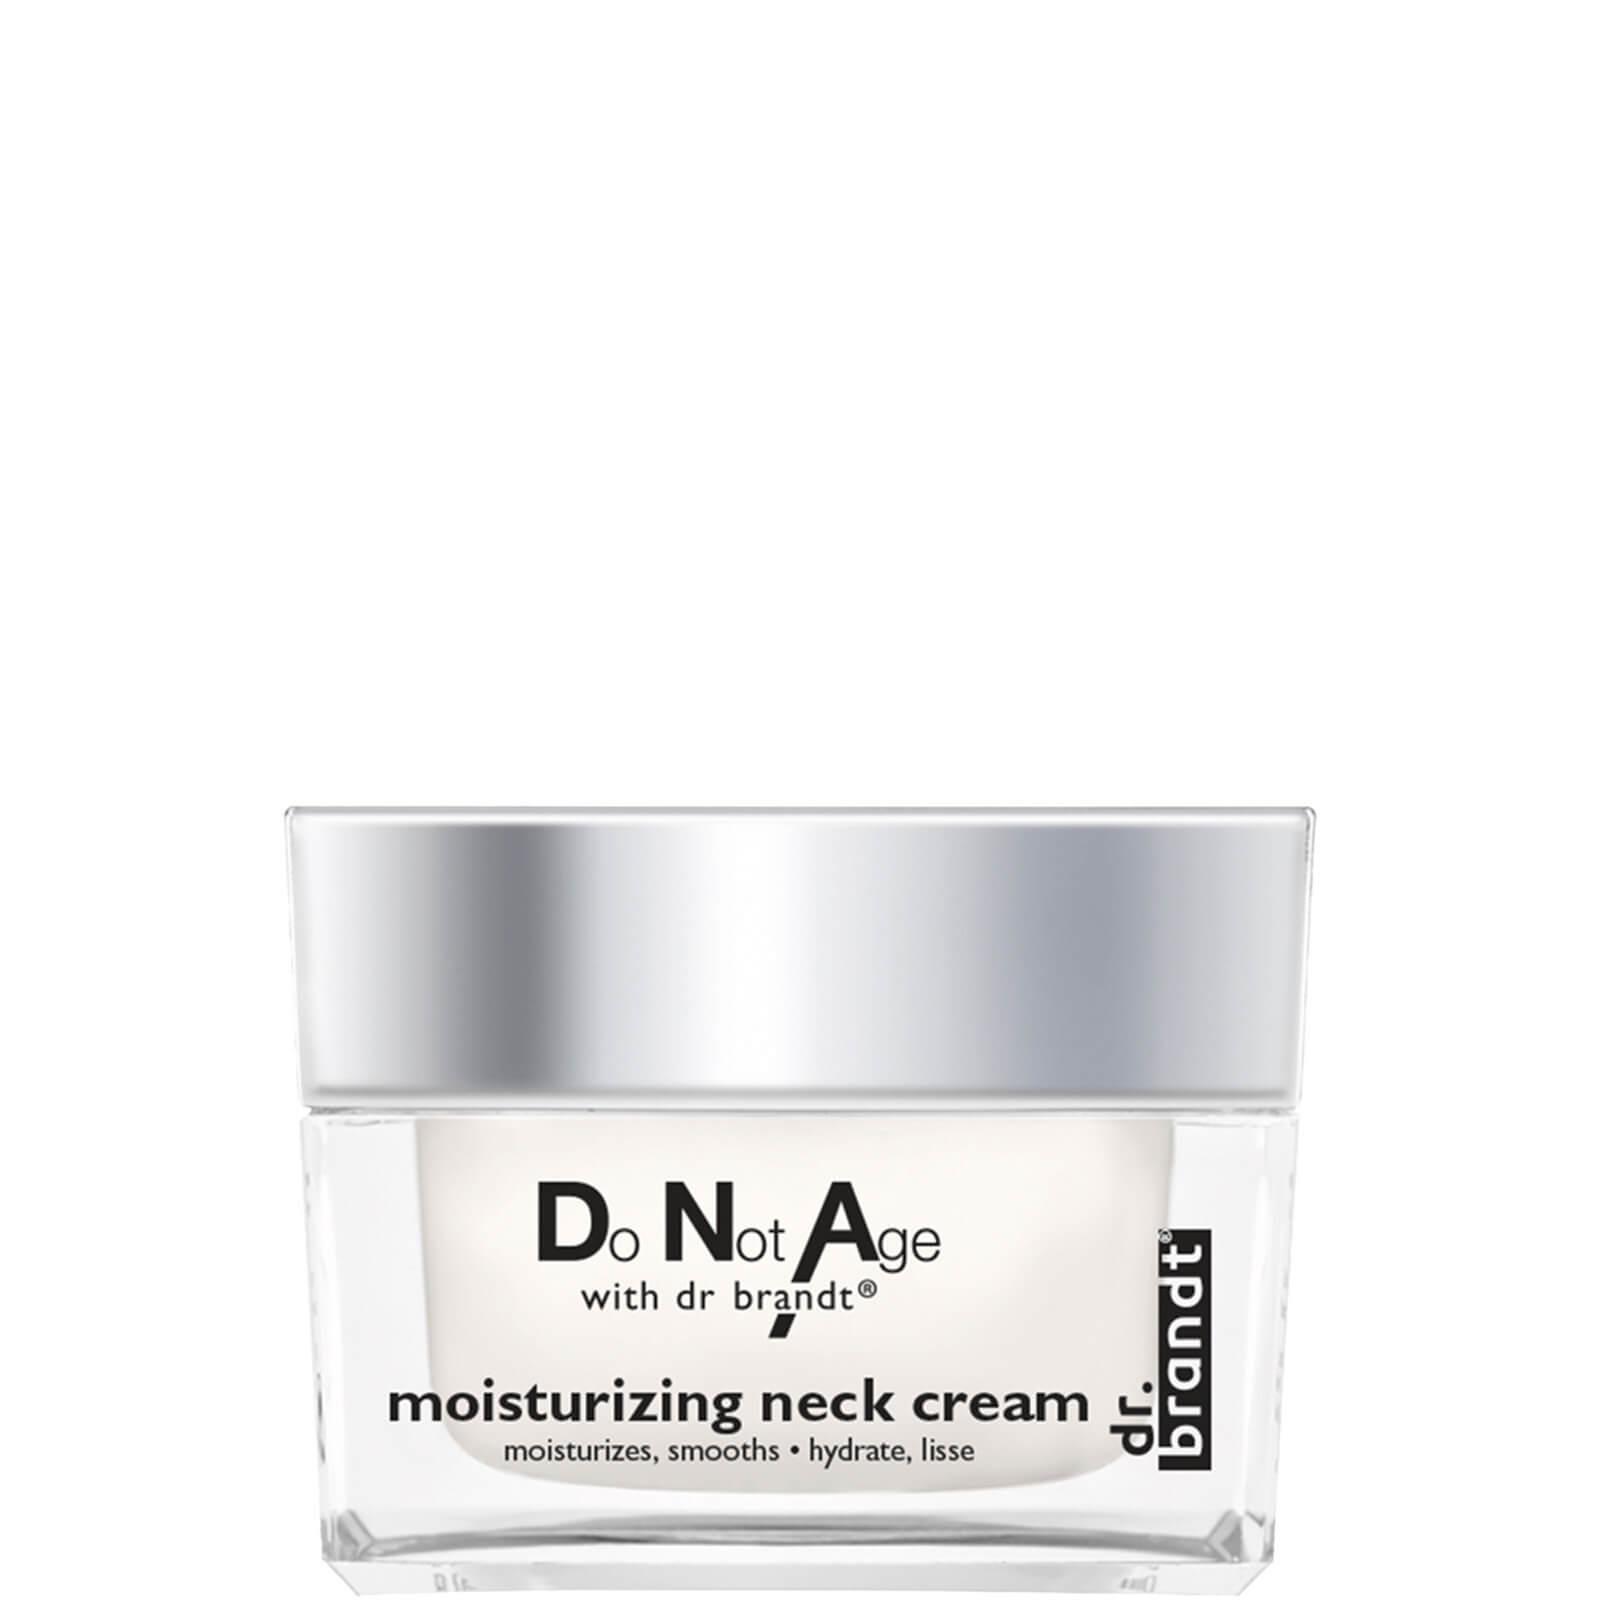 Купить Dr. Brandt Do Not Age Moisturizing Neck Cream 50ml